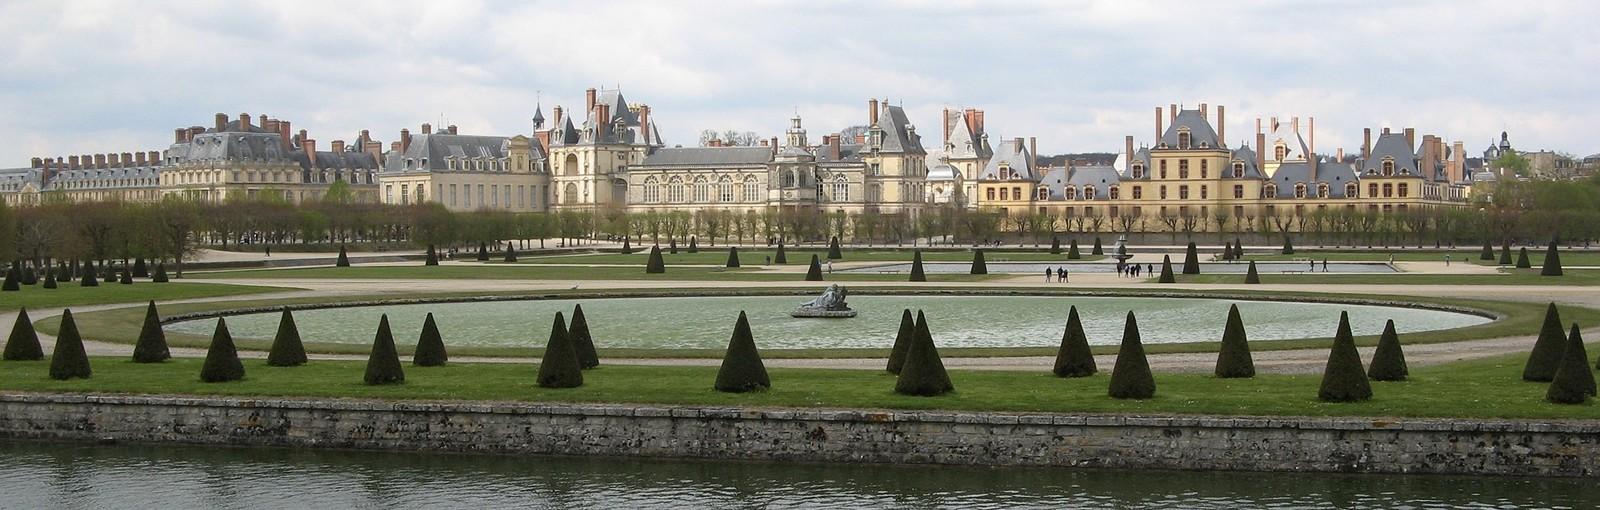 Tours 枫丹白露宫-巴比松画家村 - 半日游 - 从巴黎出发的一日游